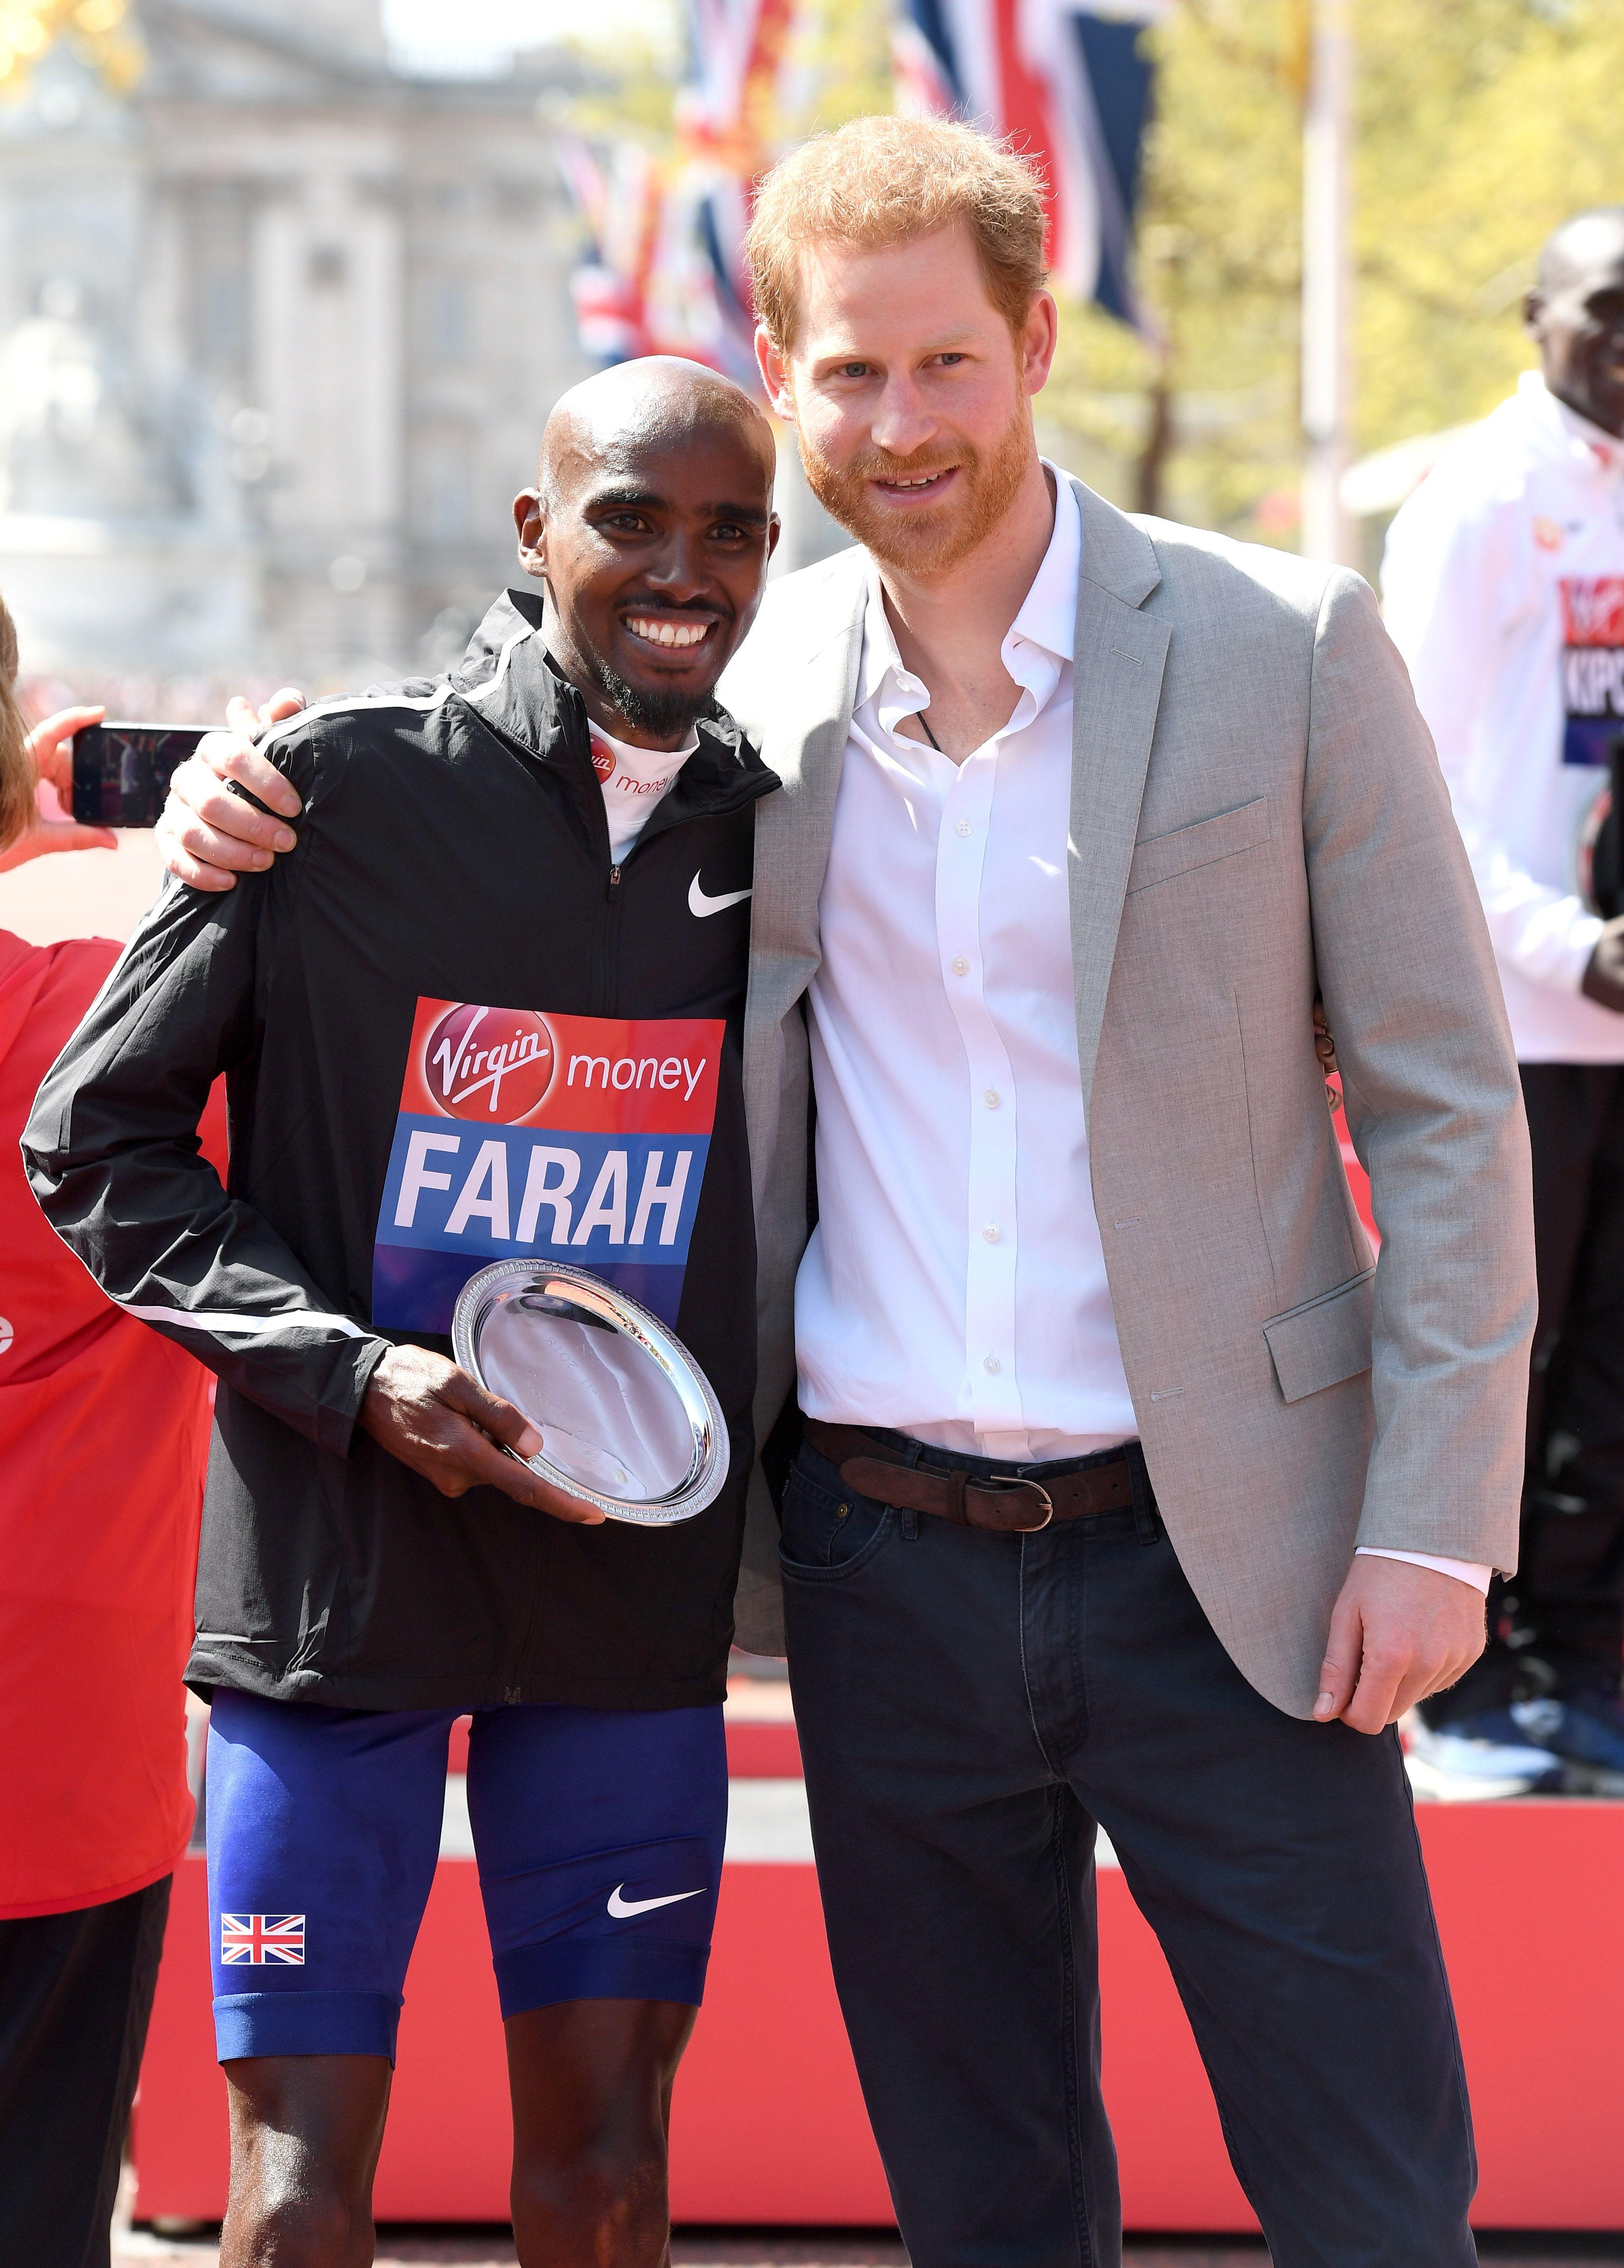 Will Prince Harry still be at the London Marathon finish line?